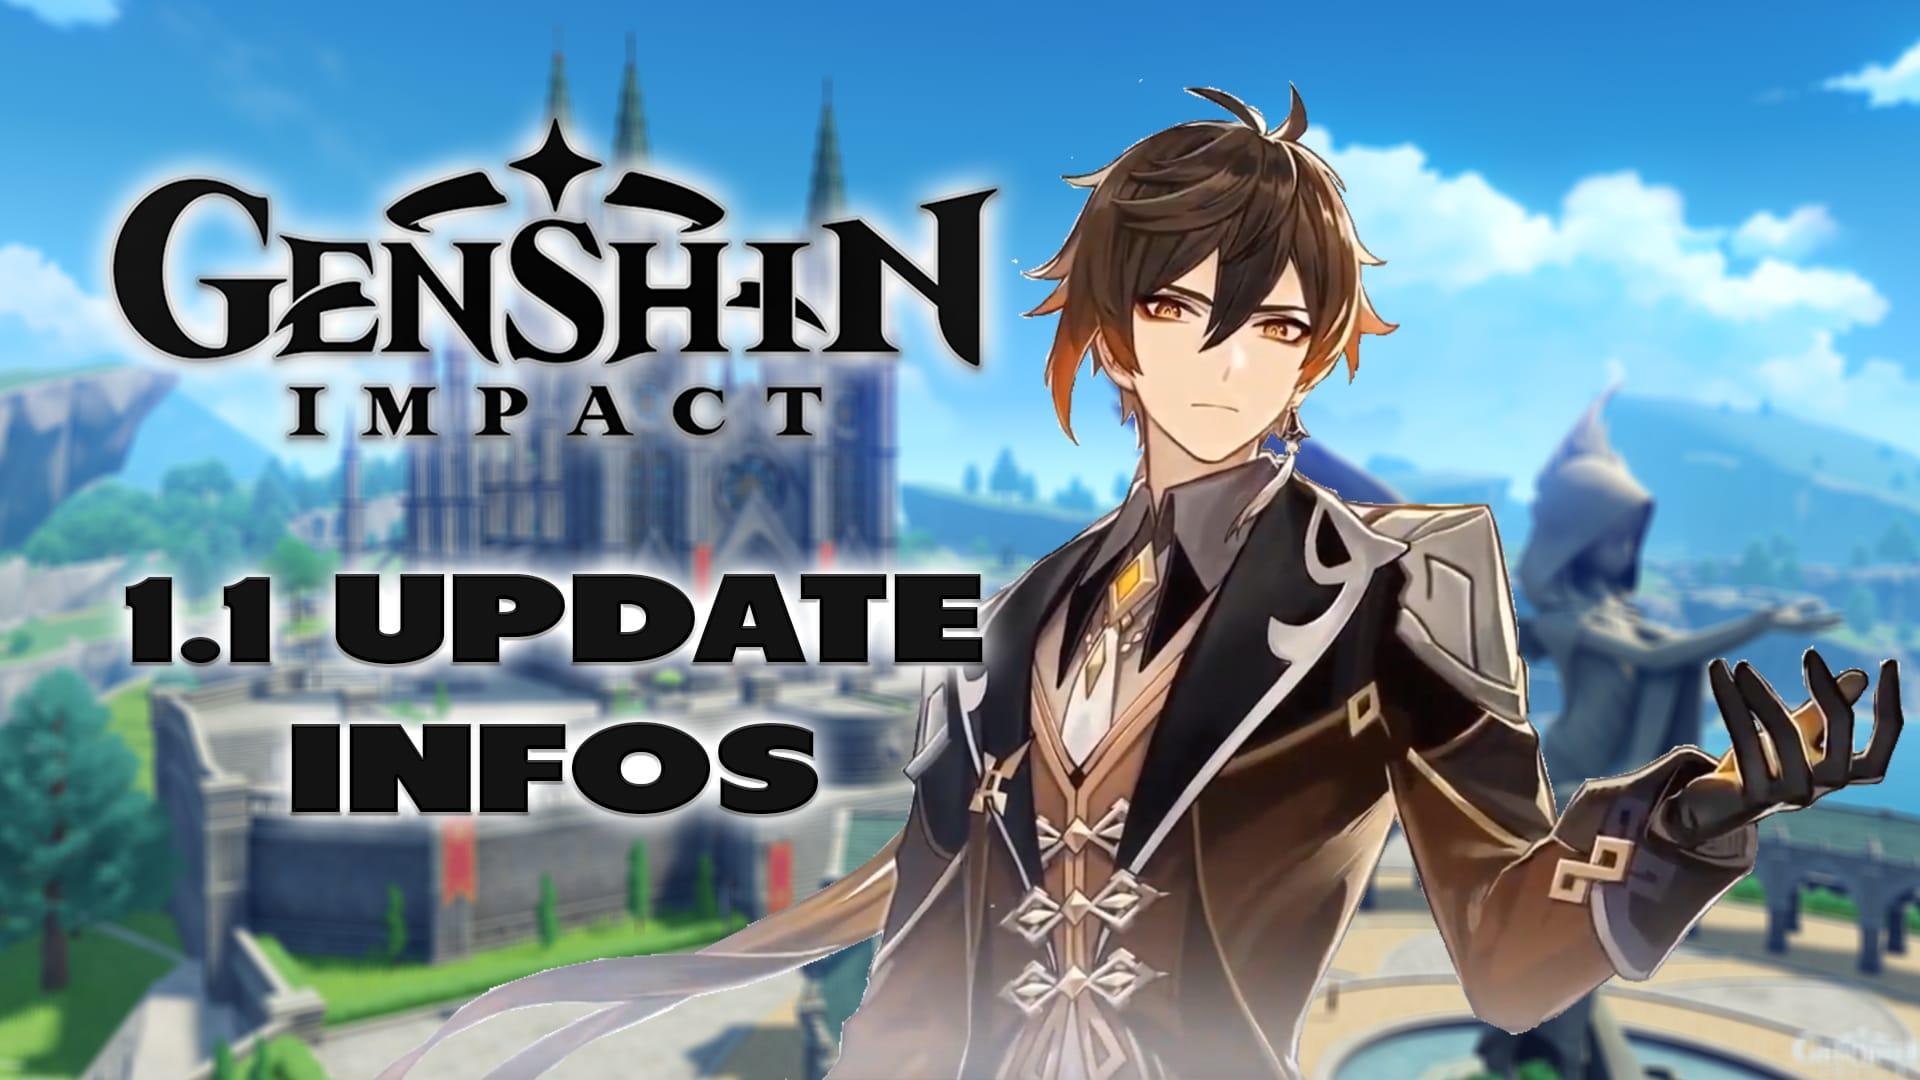 Genshin Impact: 1.1 Update Informationen - Haton.net